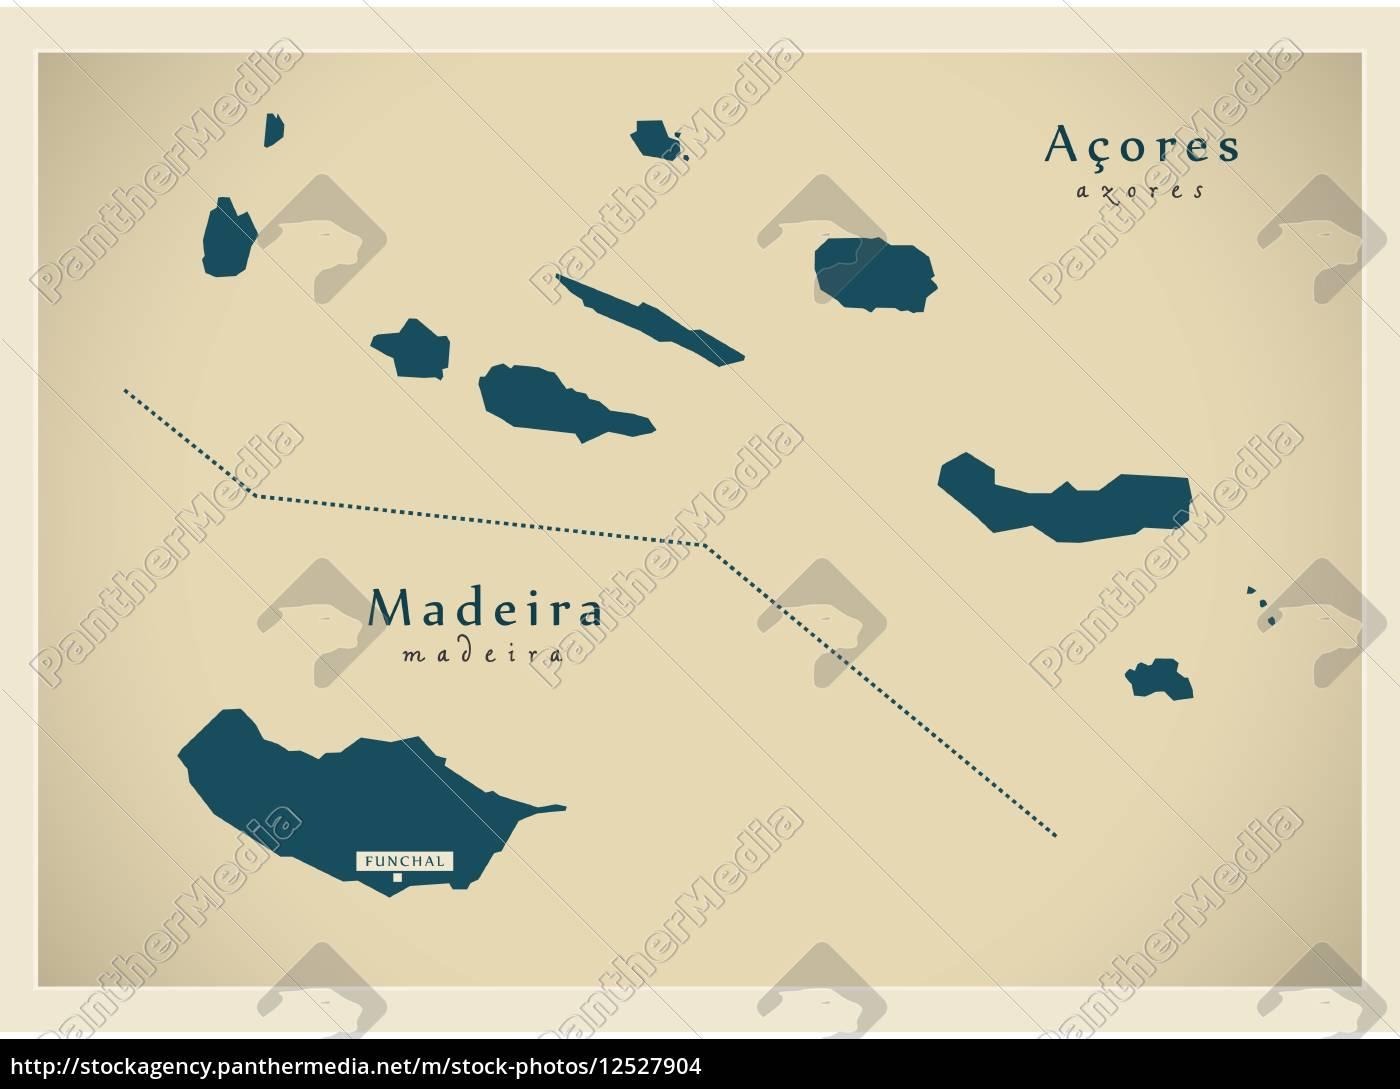 moderne, landkarte, -, acores, &, madeira - 12527904